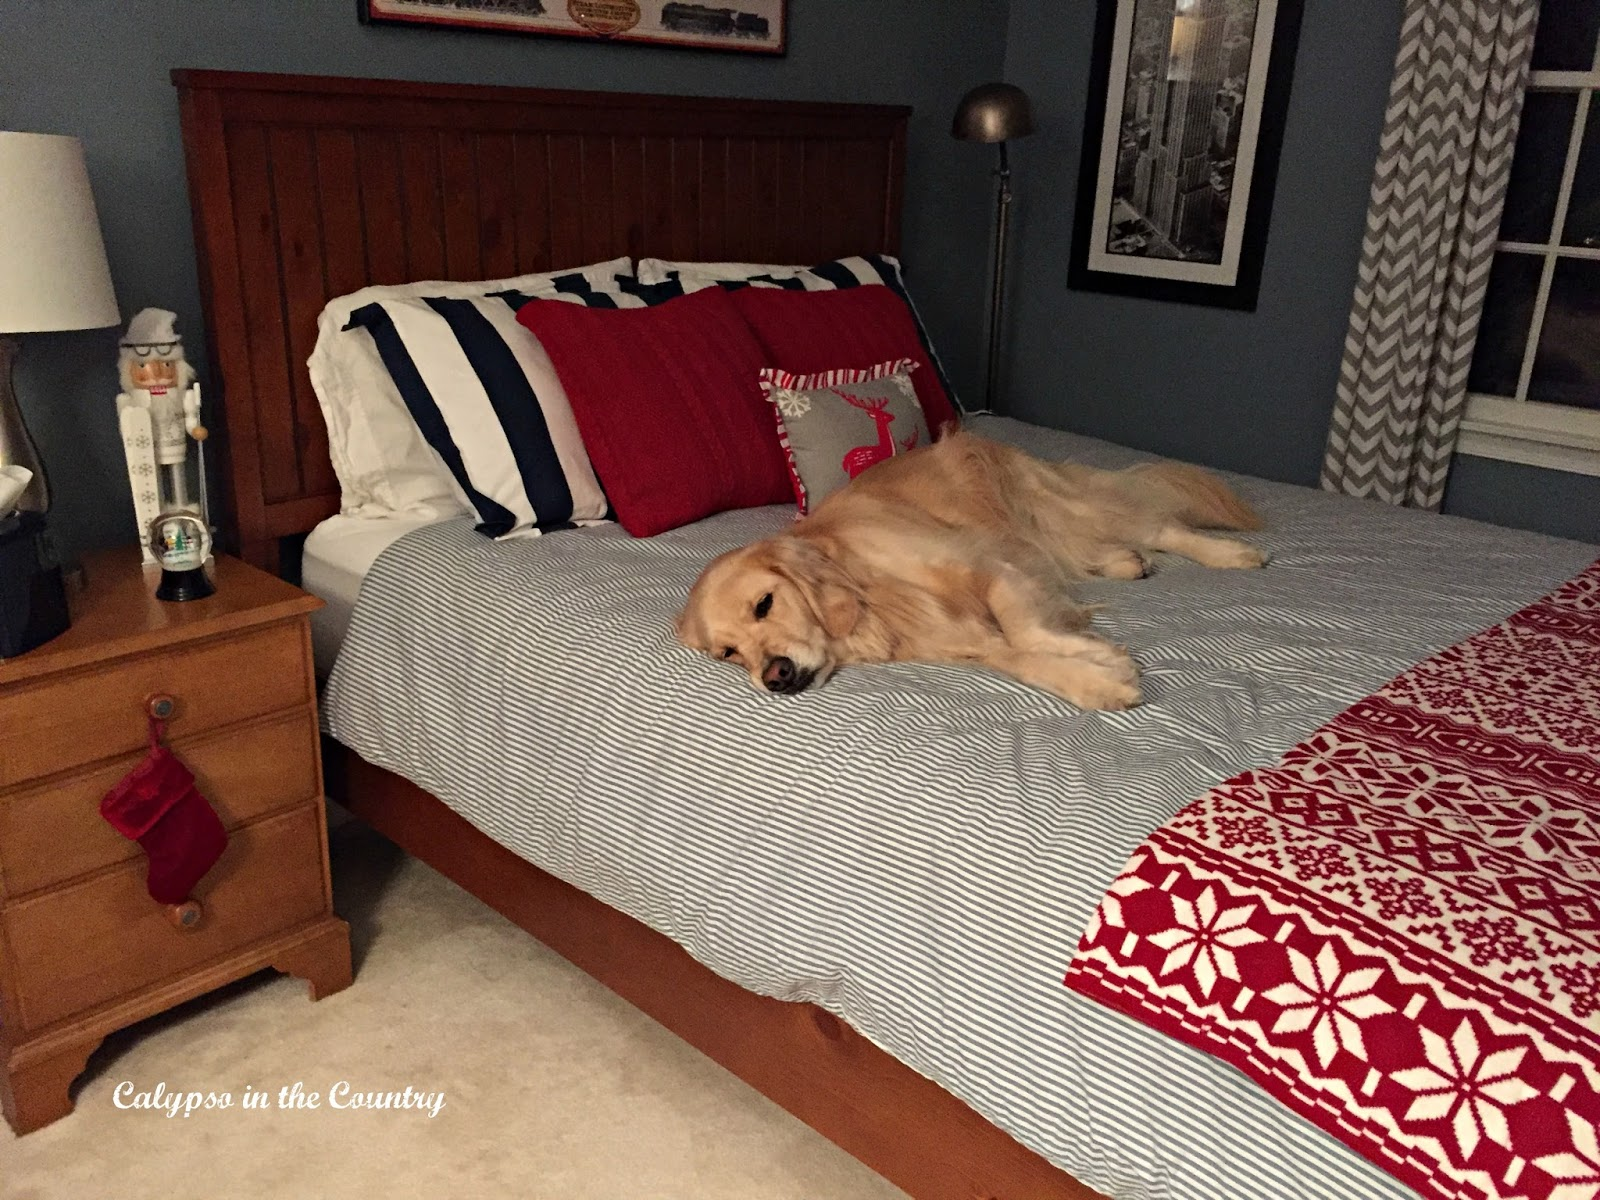 Golden Retriever on Bed